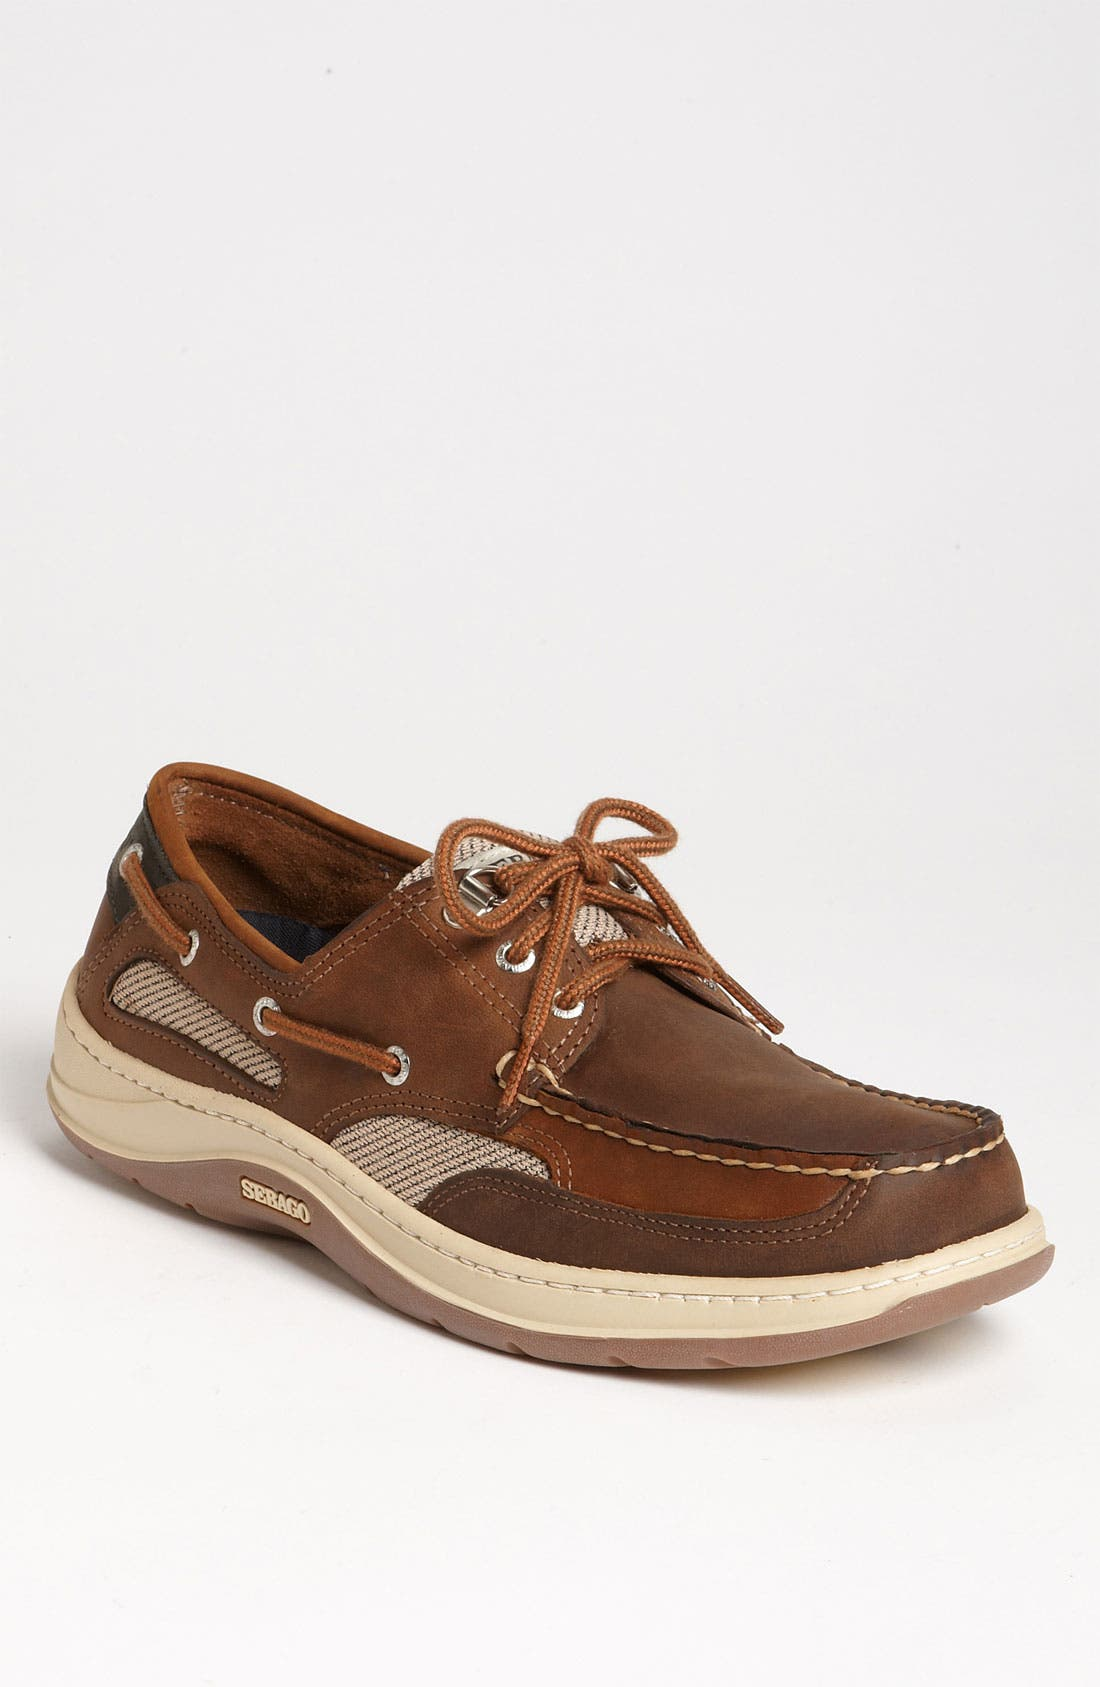 Main Image - Sebago 'Clovehitch II' Boat Shoe